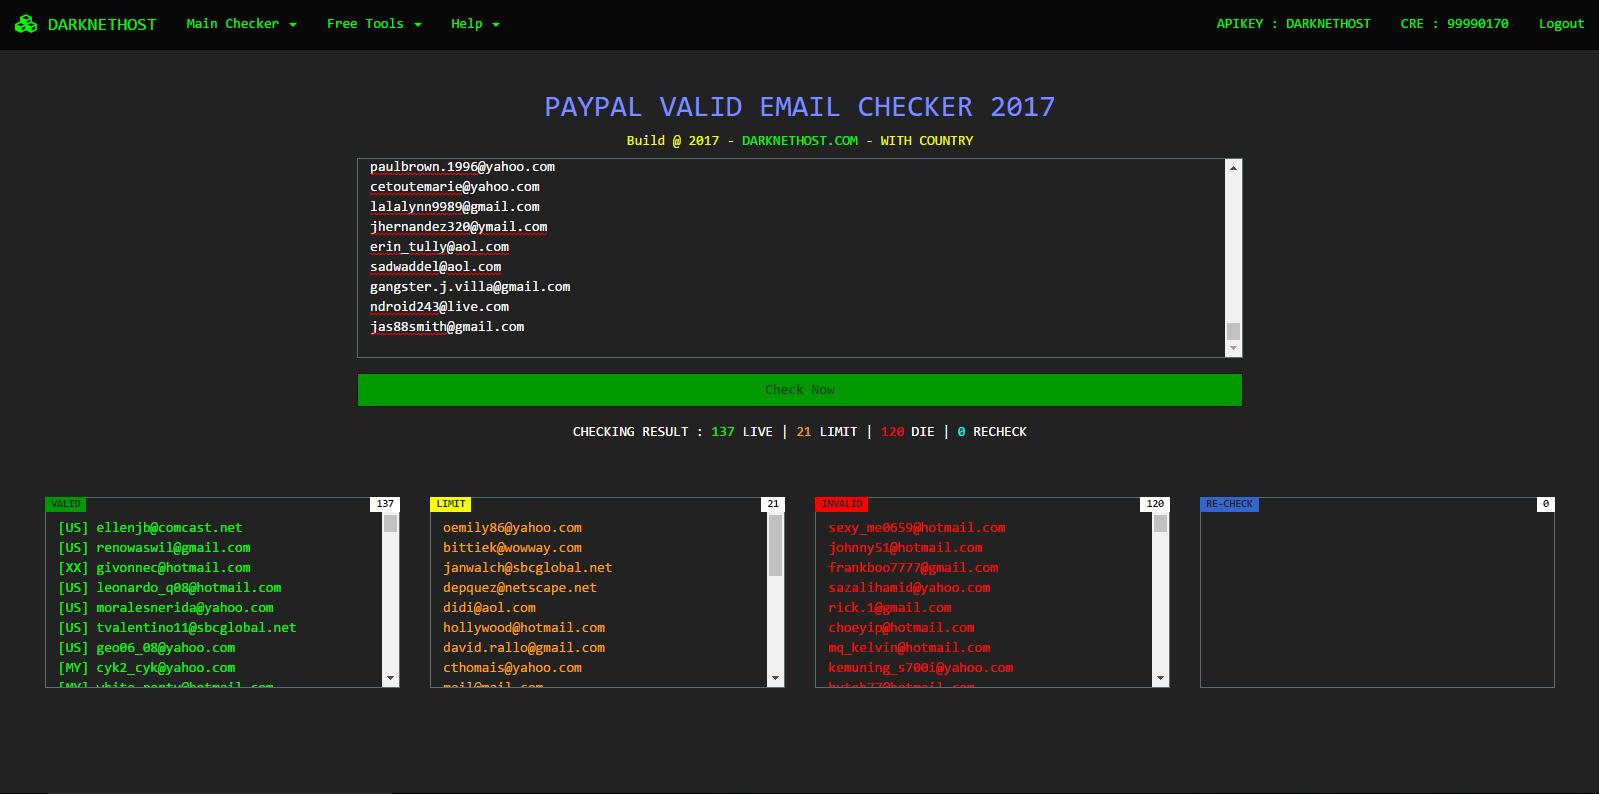 Hello my family   SpyHackerz Org Hack Forum - Hack Forumu